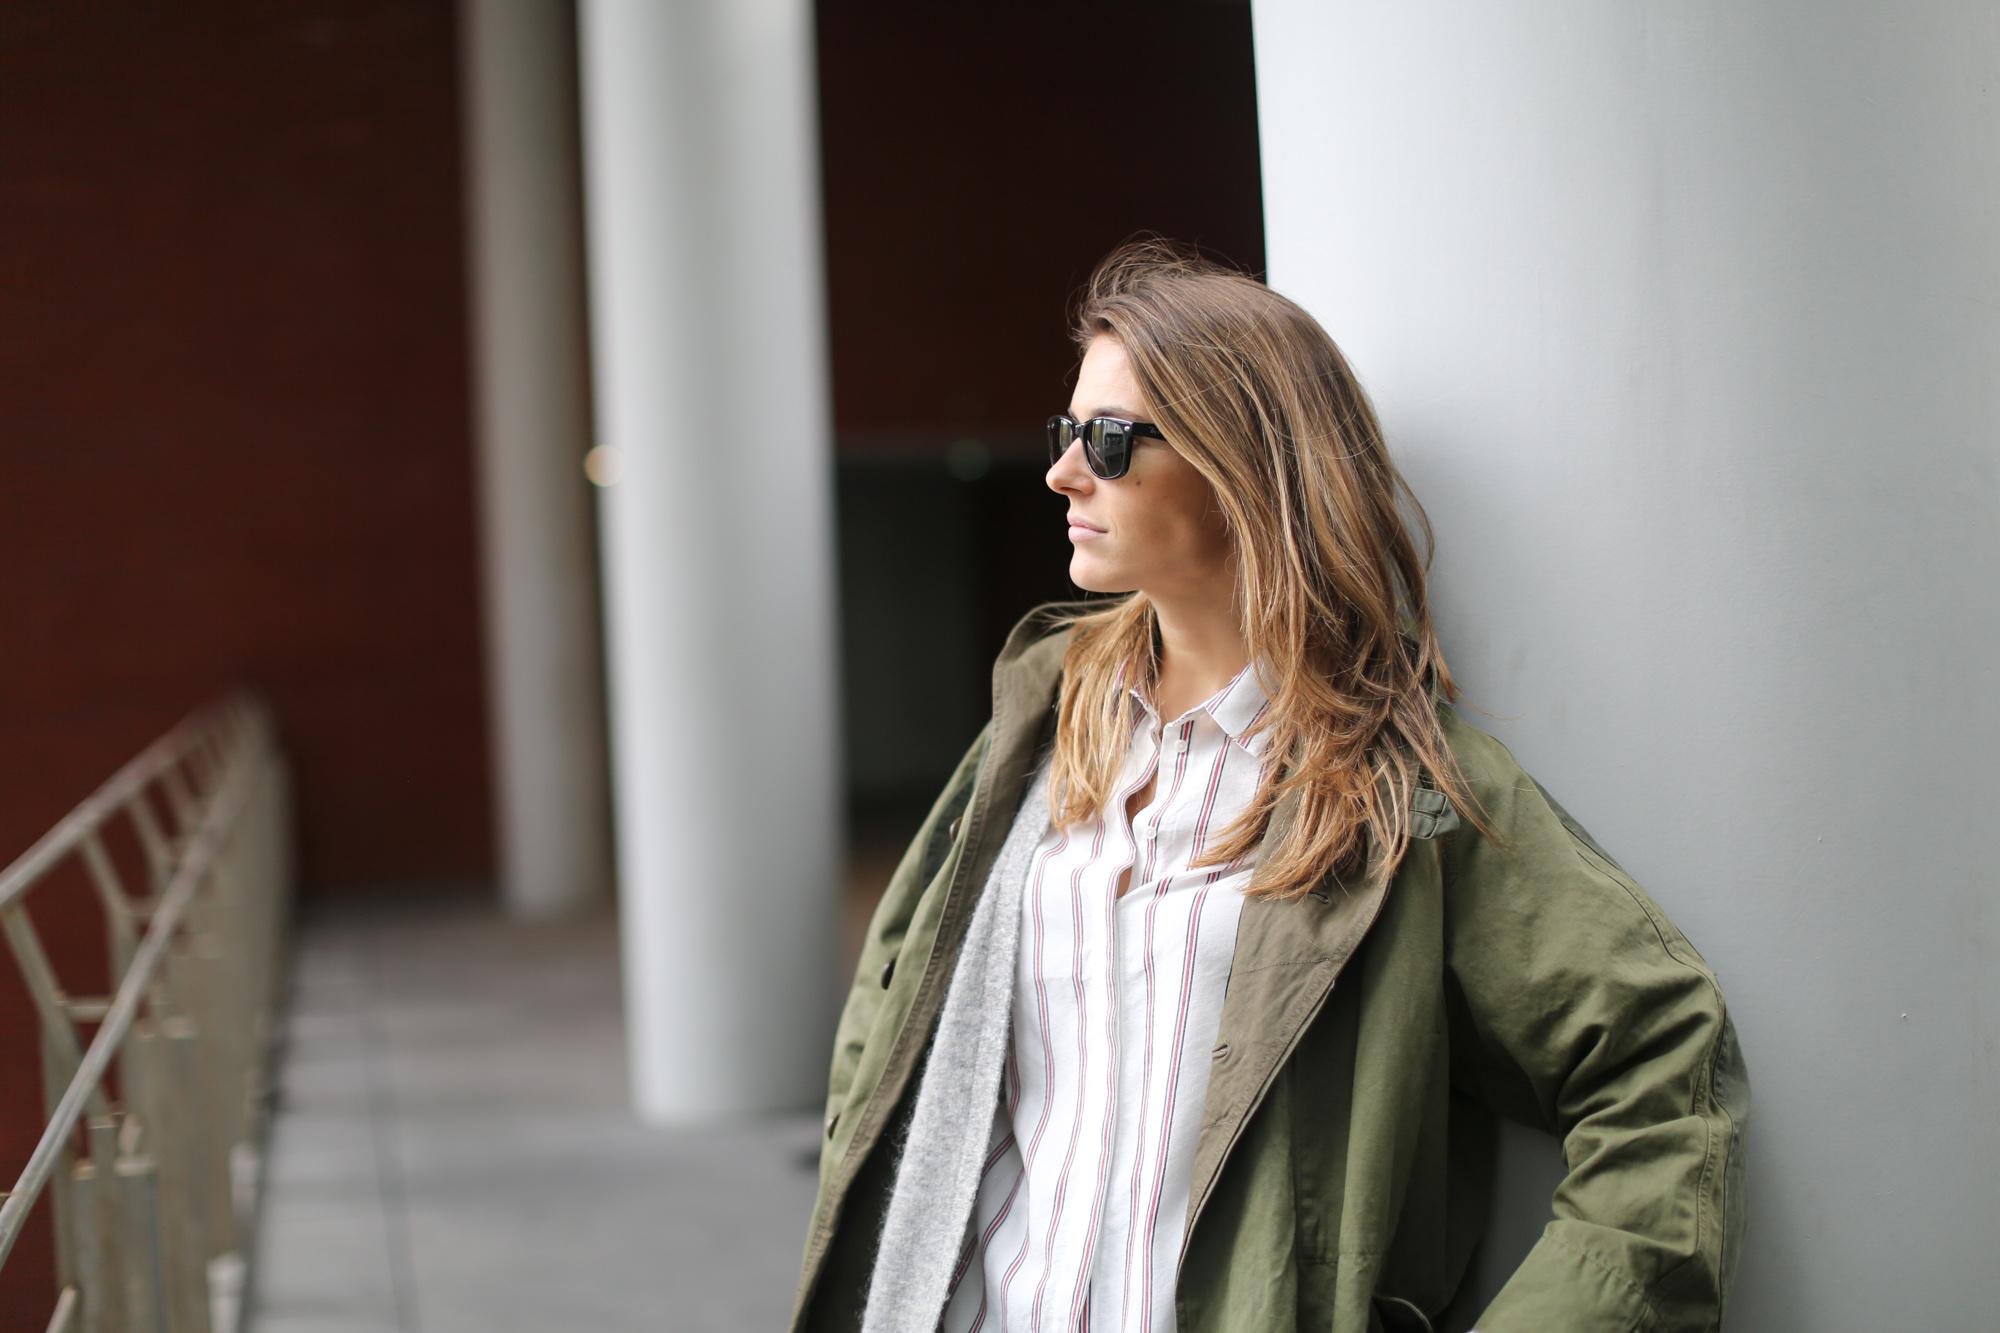 Clochet-streetstyle-isabel-marant-ellison-parka-h&m-trend-shirt-5